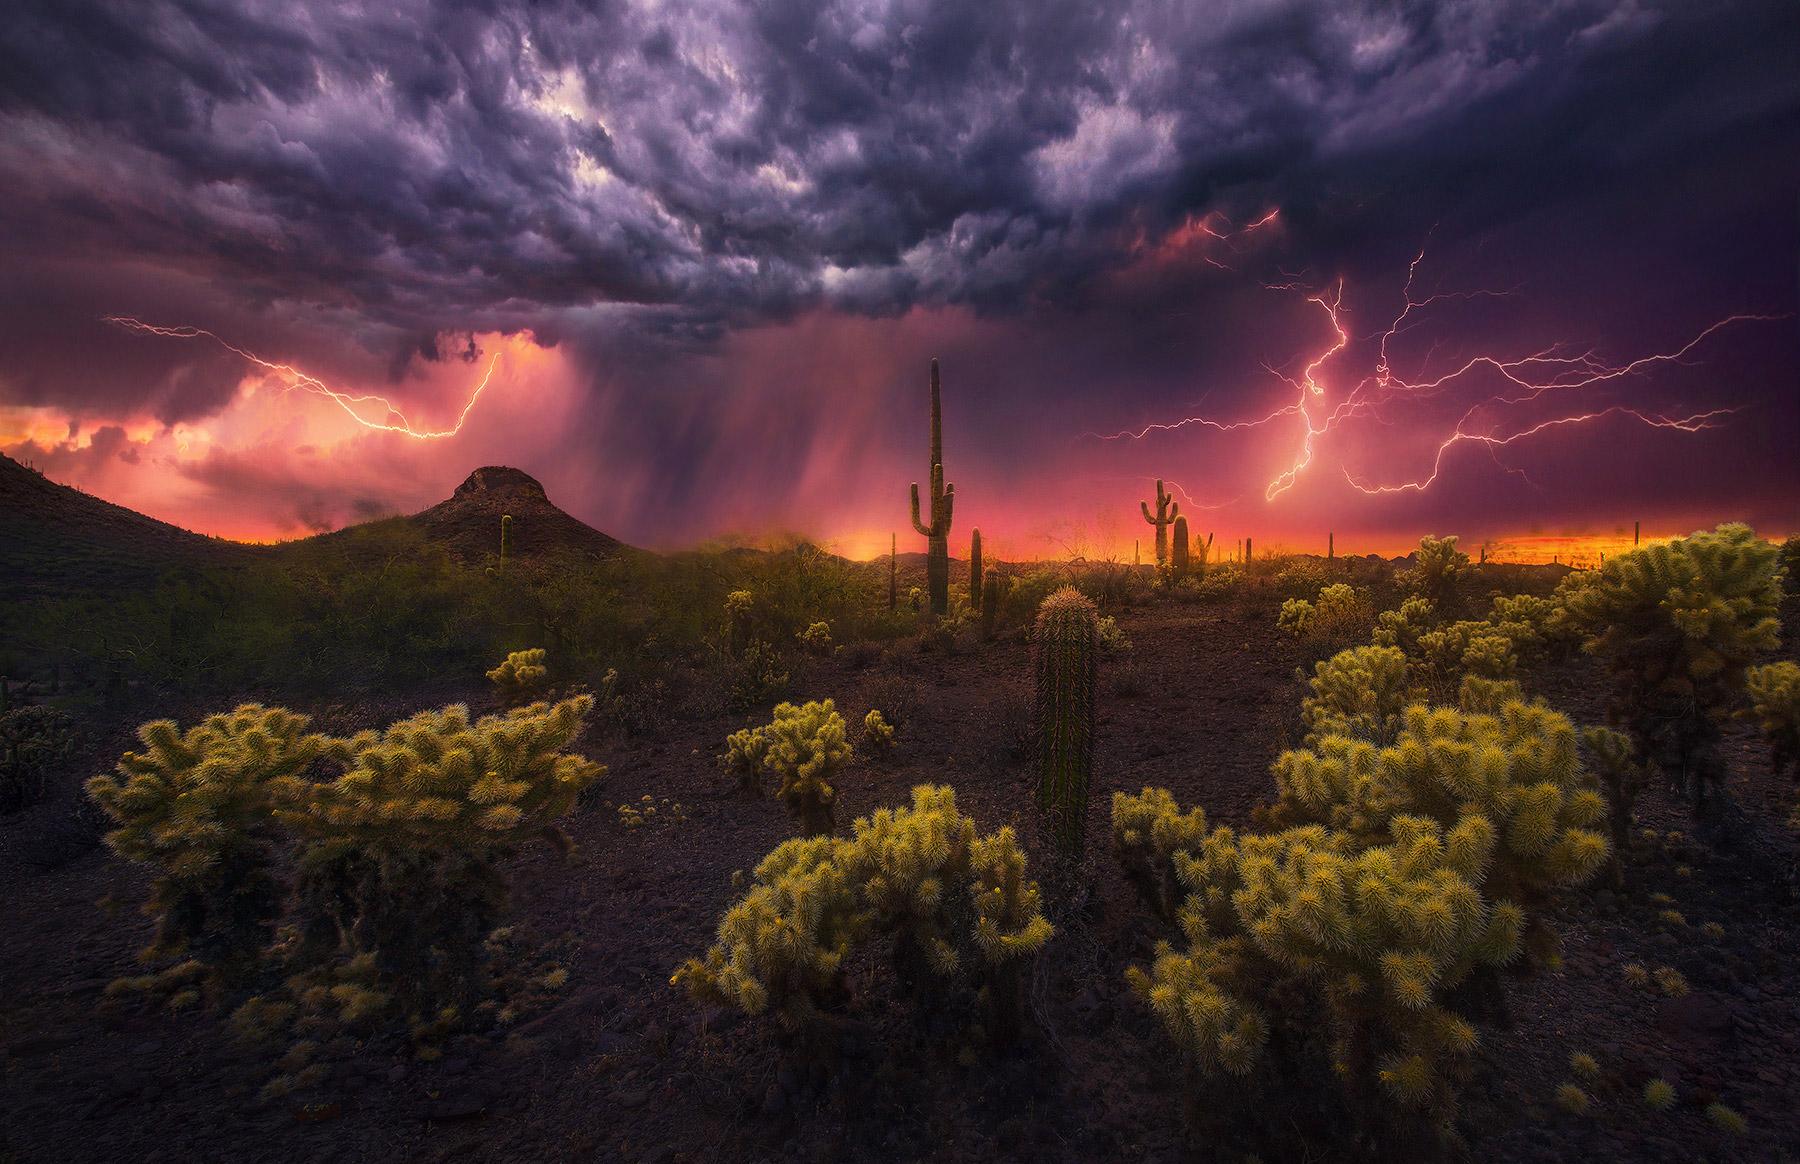 Cactus, desert, lightning, sonoran, phoenix, thunderstorm, monsoon, photo